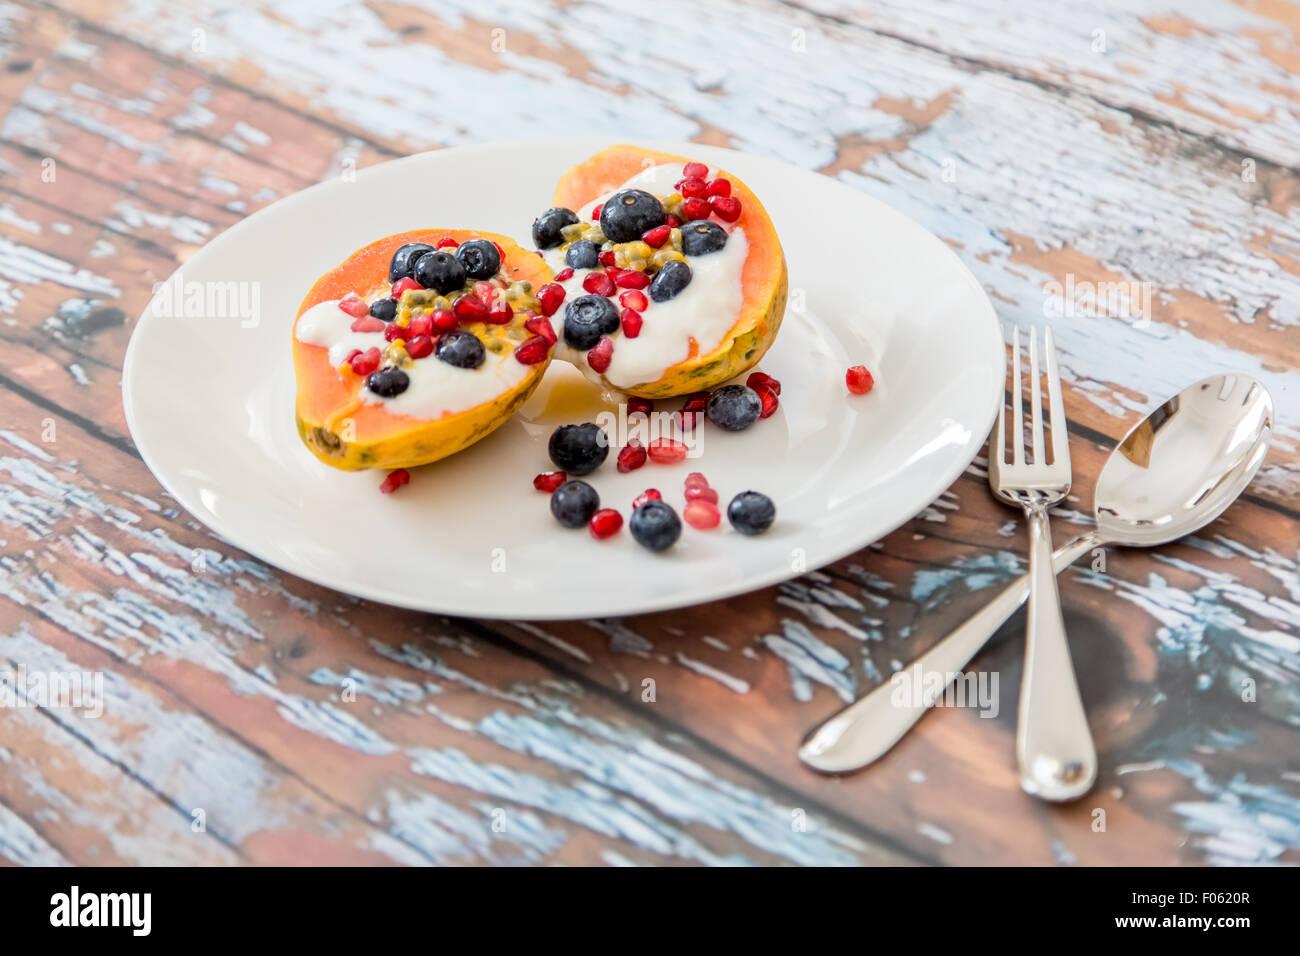 papaya with natural soy yogurt and fresh berries, light and healthy breakfast, papaya, blueberries, passion fruit, - Stock Image